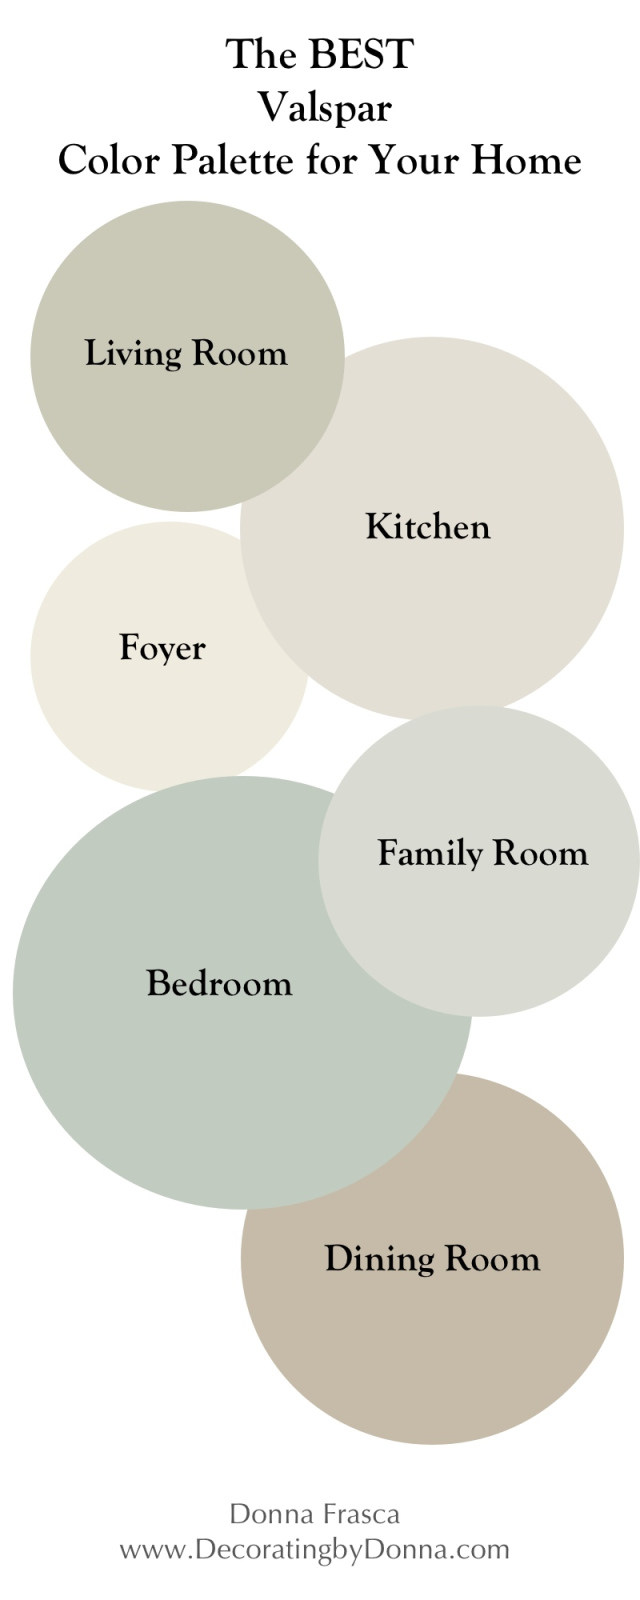 the-best-valspar-color-palette-for-your-home